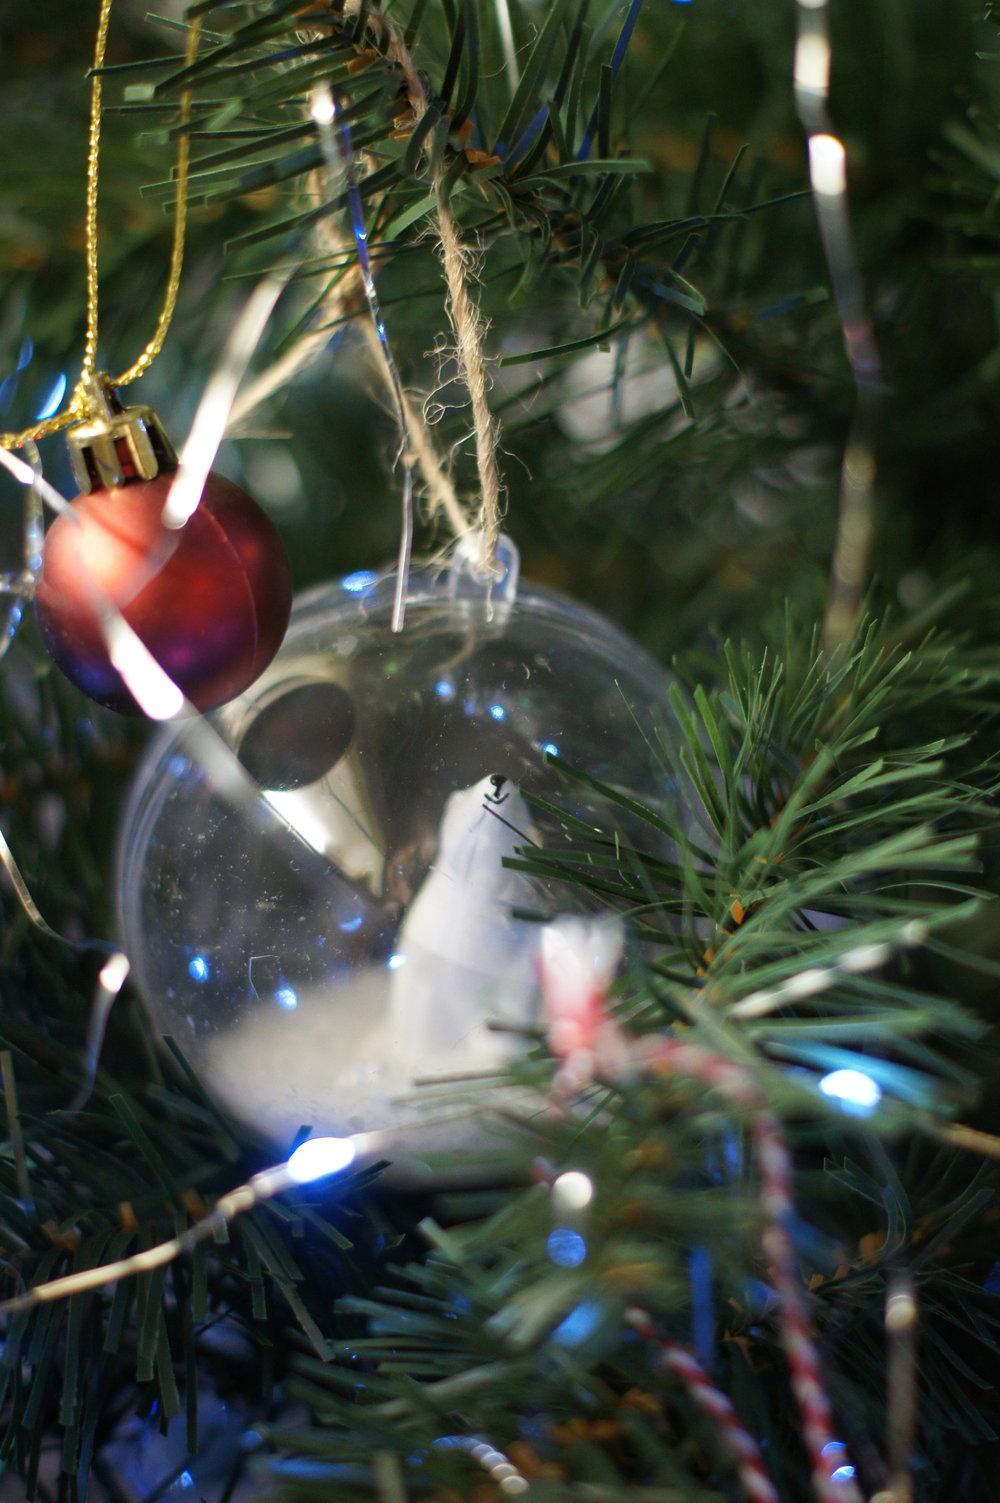 christmasbauble.jpg